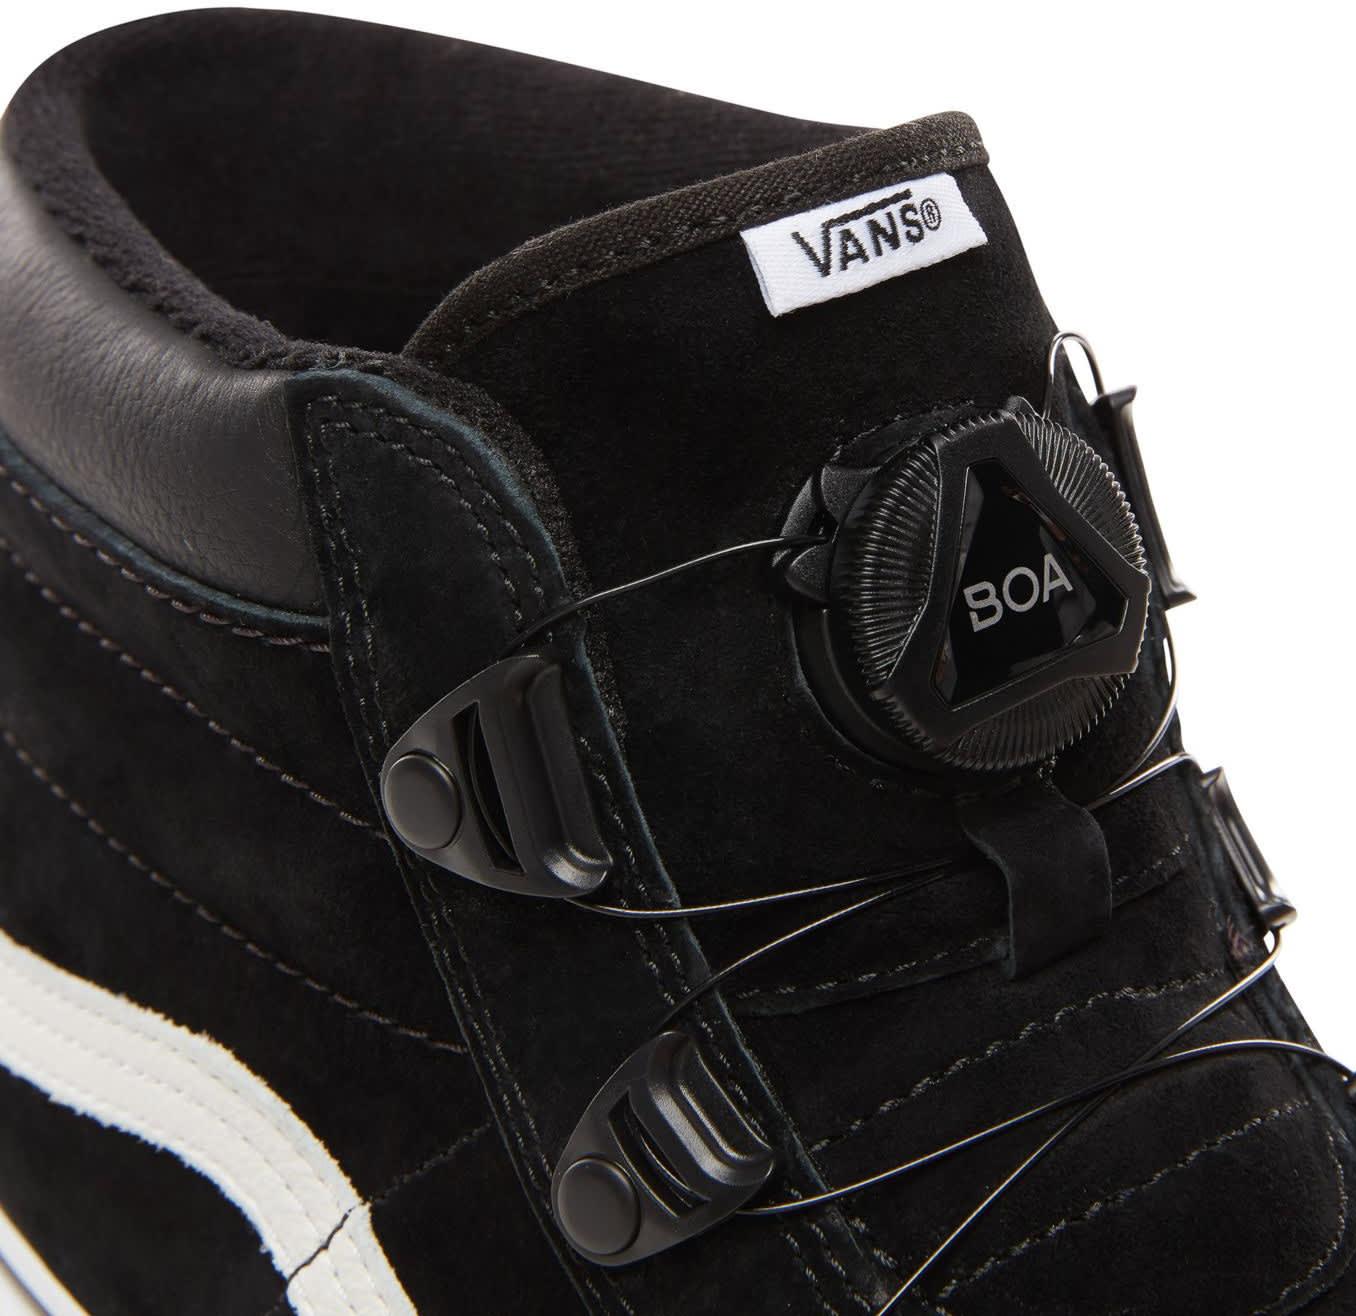 49b59bede35feb Vans Sk8-Hi MTE BOA Shoes - thumbnail 6